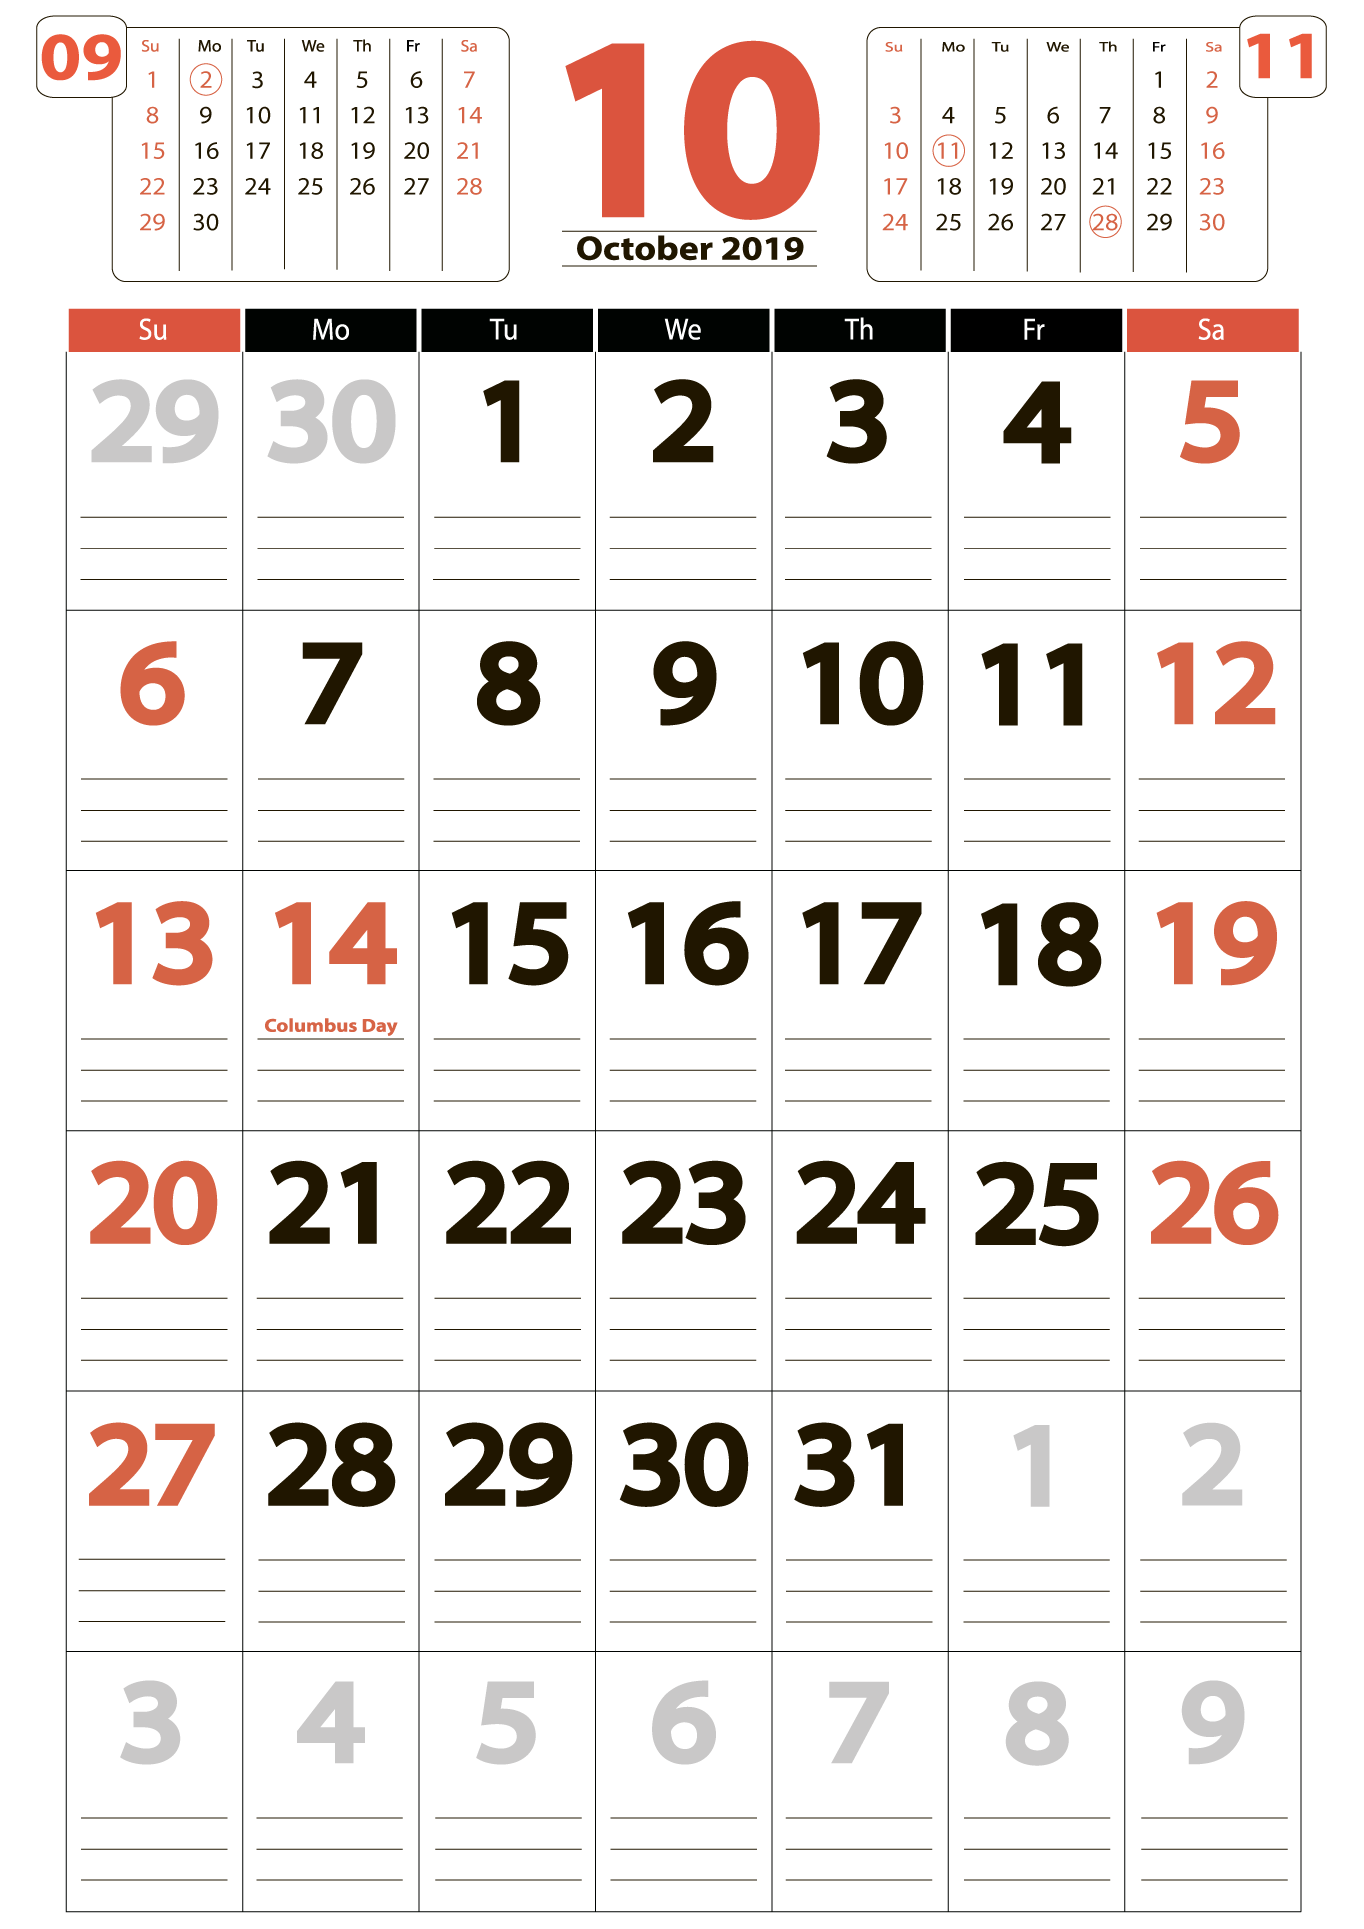 Download calendar 10 2019